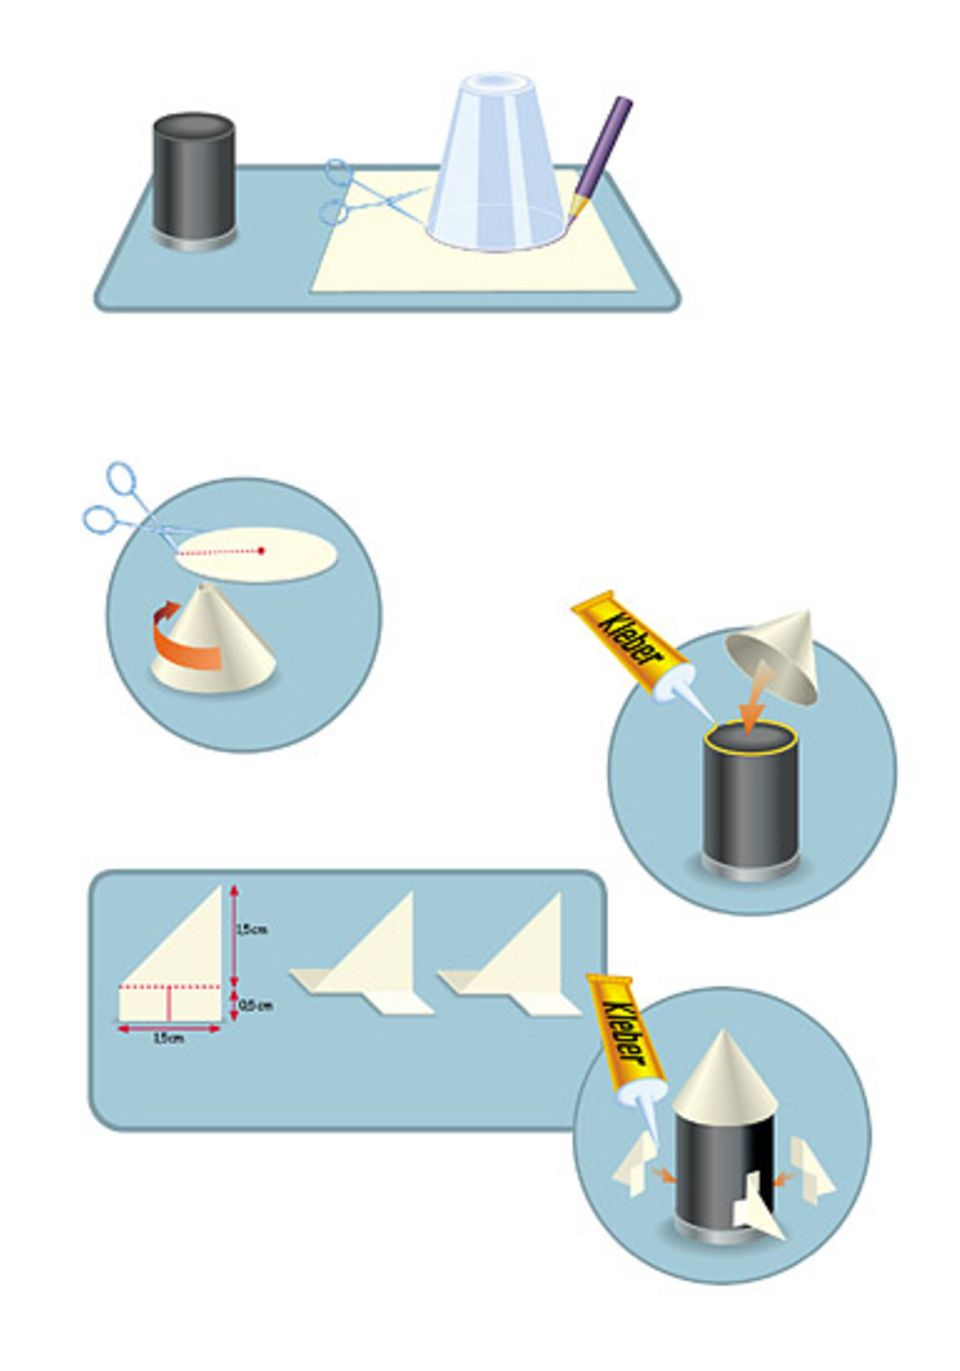 Basteln: Experimente mit Backpulver